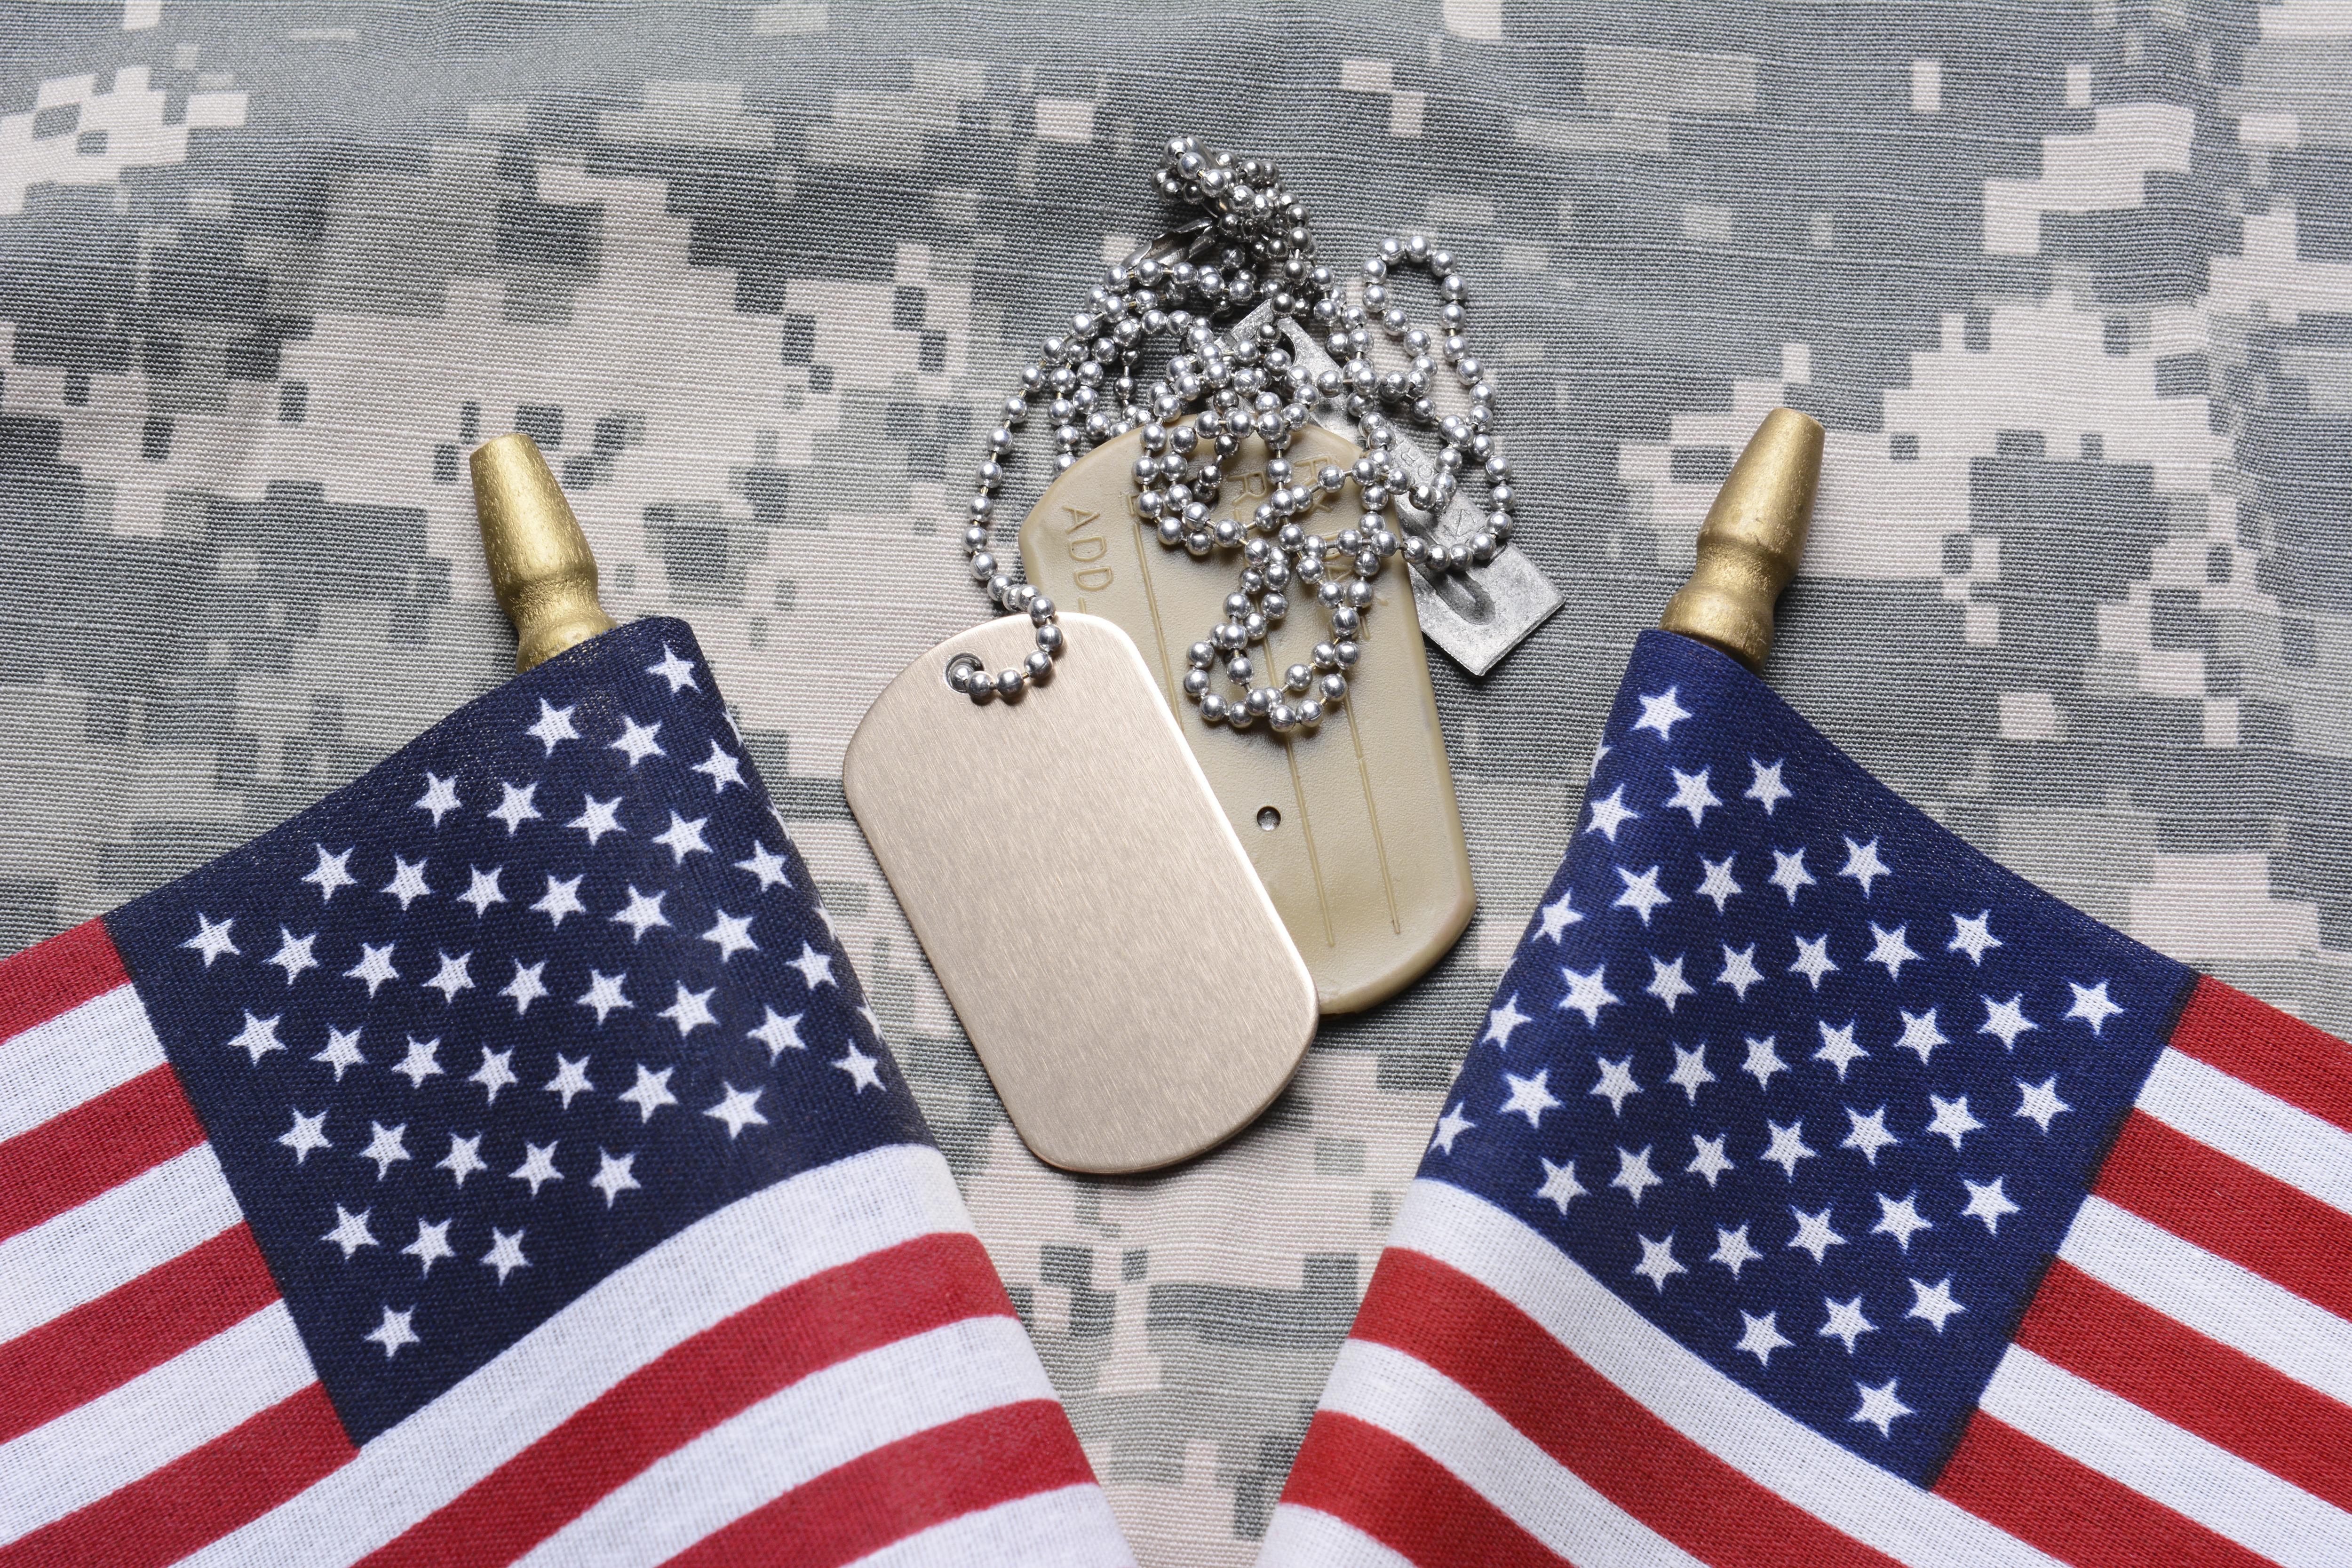 Christopher & Dana Reeve Foundation's Military Veterans Program